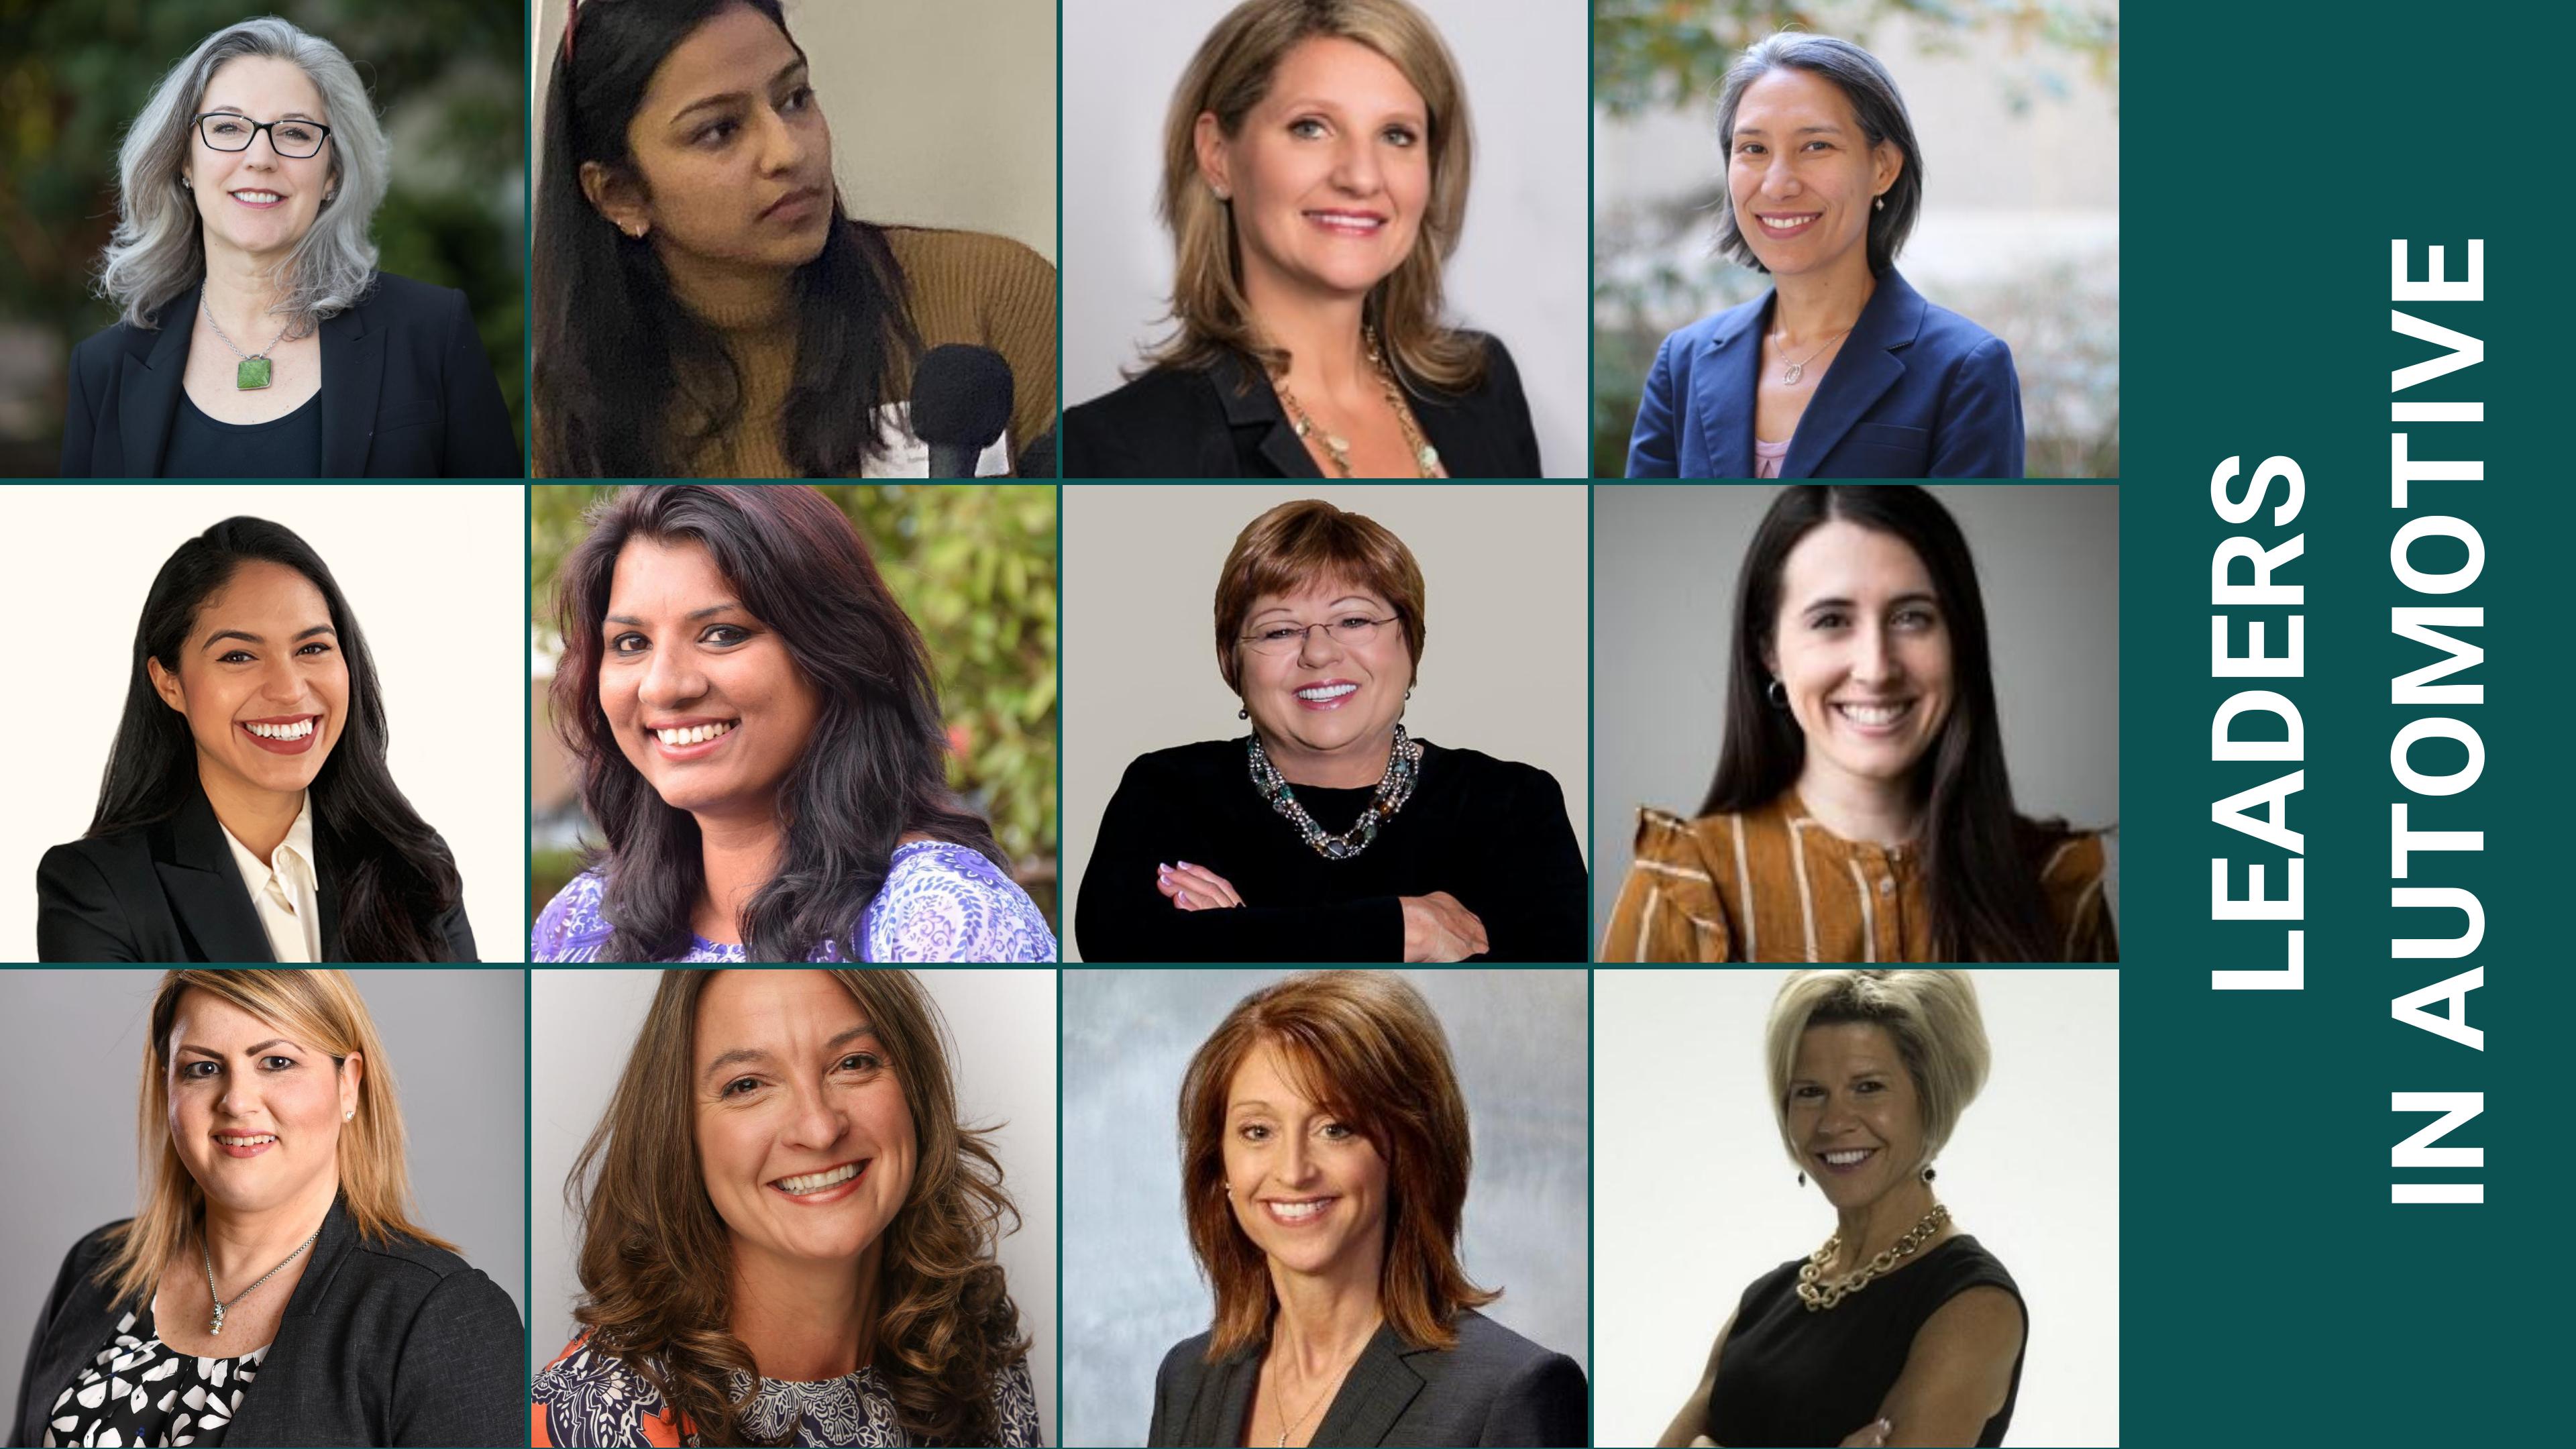 Meet the Women Leads of Automotive